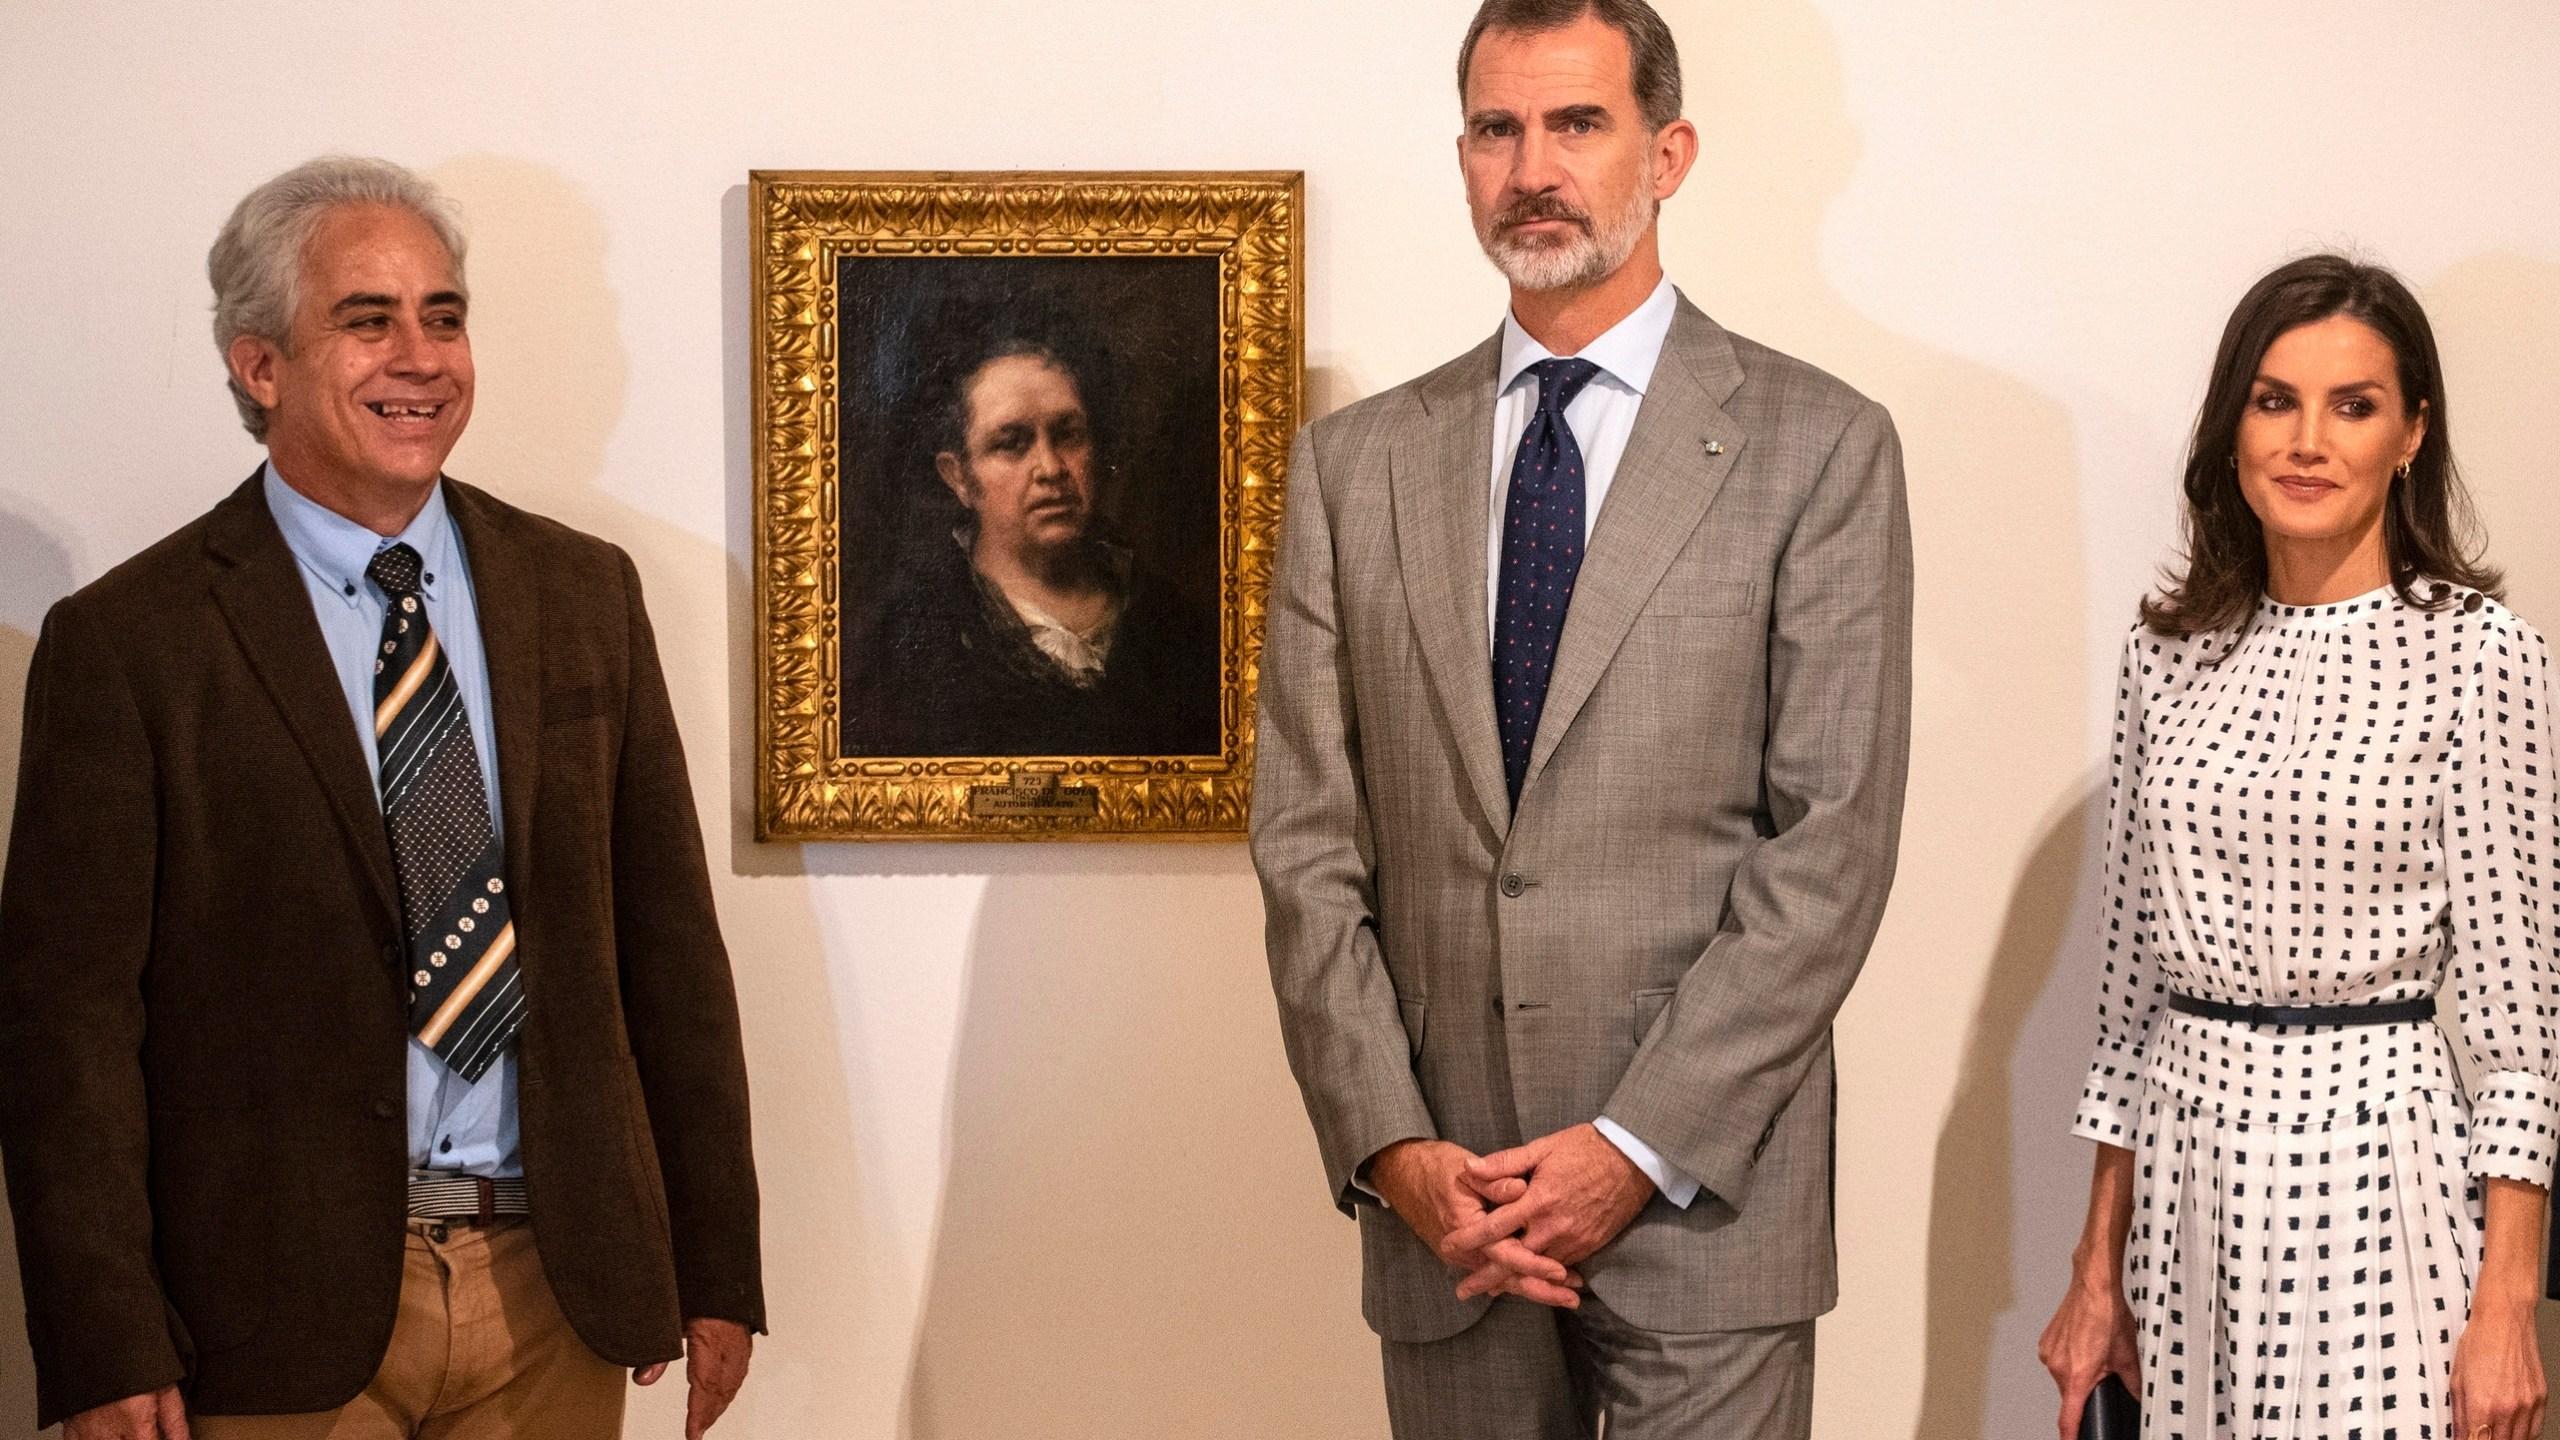 King Felipe, Letizia